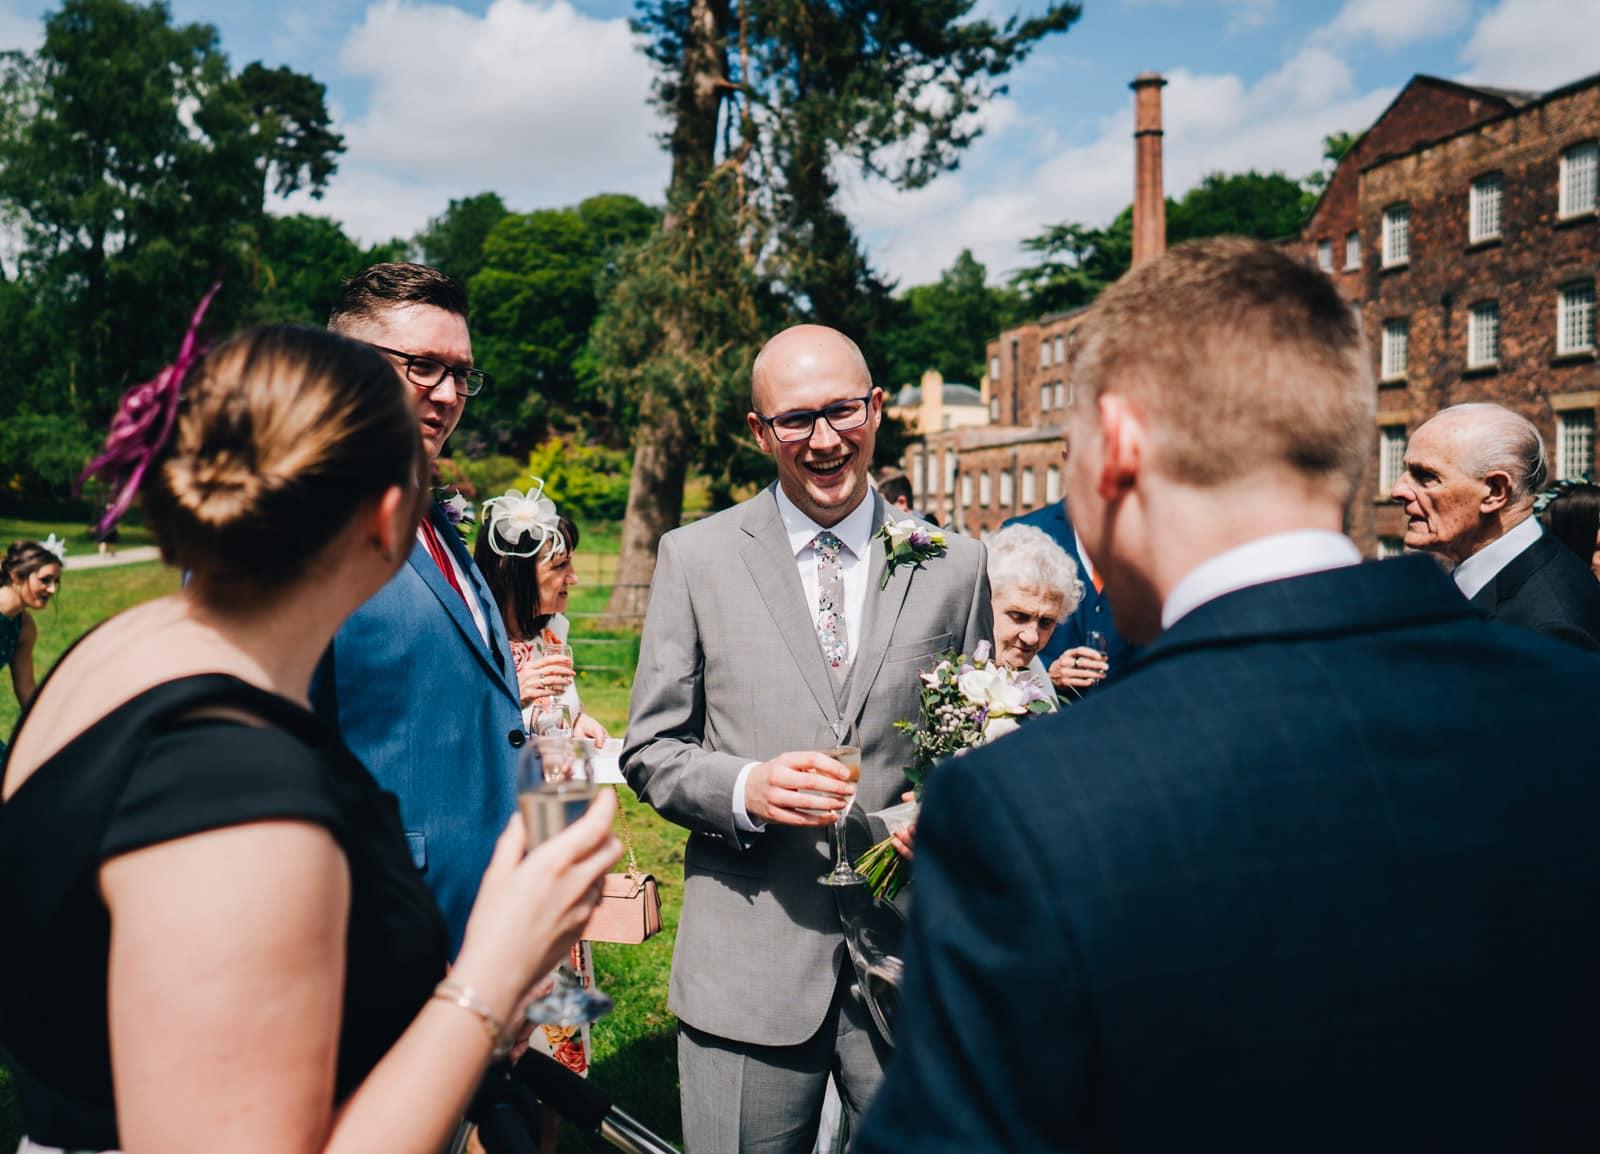 spring wedding at Quarry Bank Mill